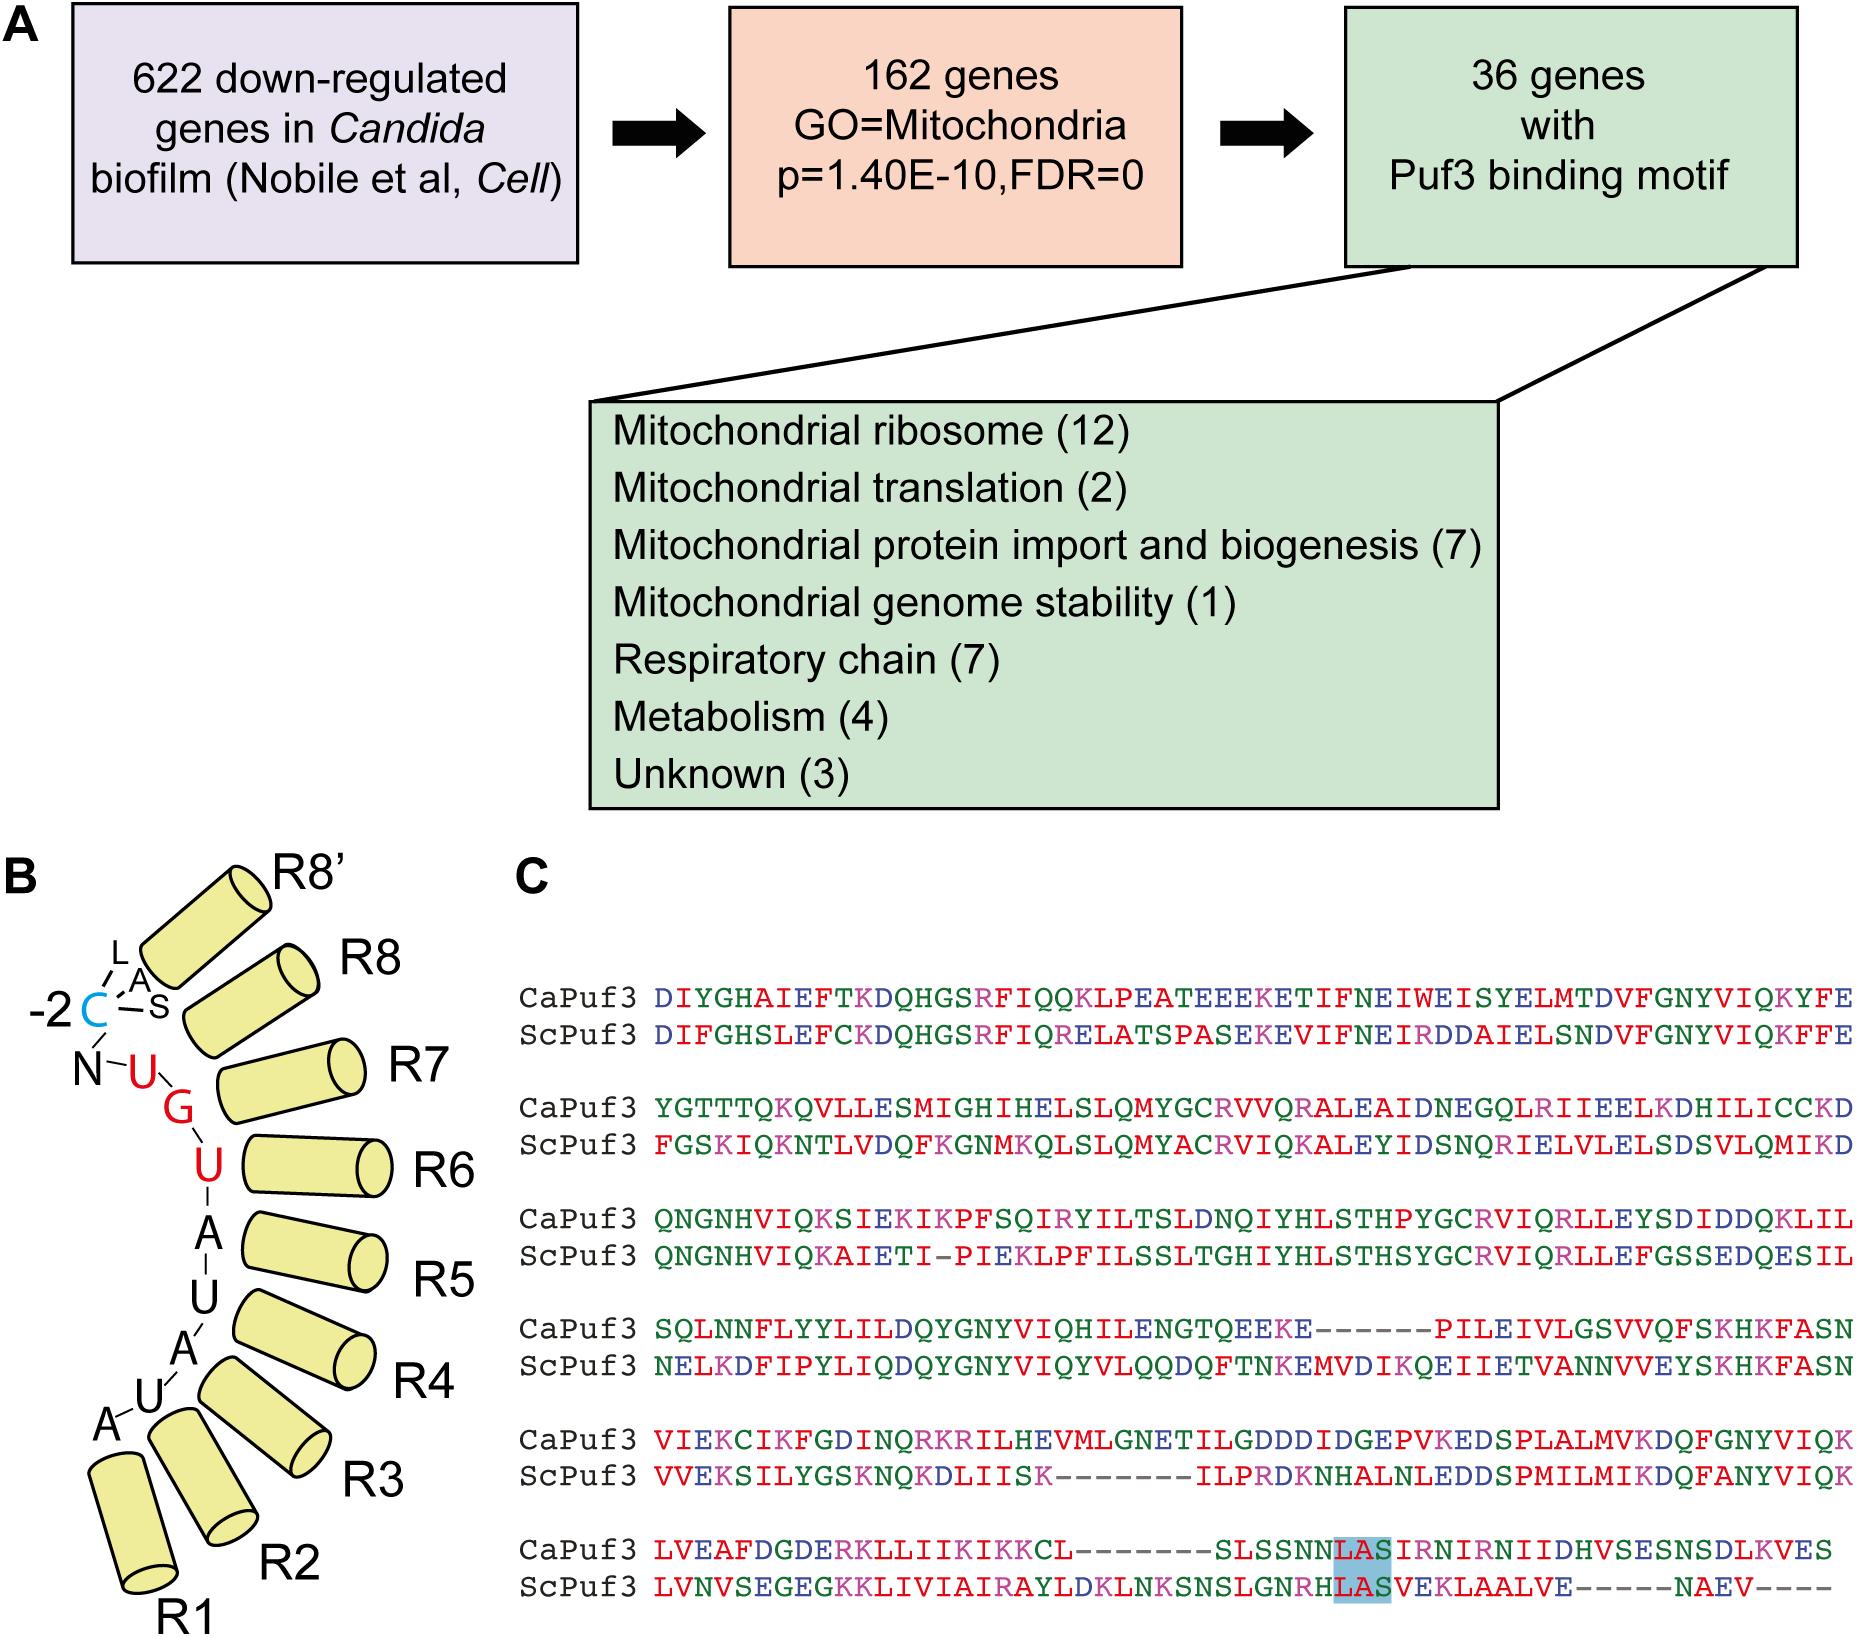 Biofilm mRNA targets of the Pumilio RNA binding protein Puf3.